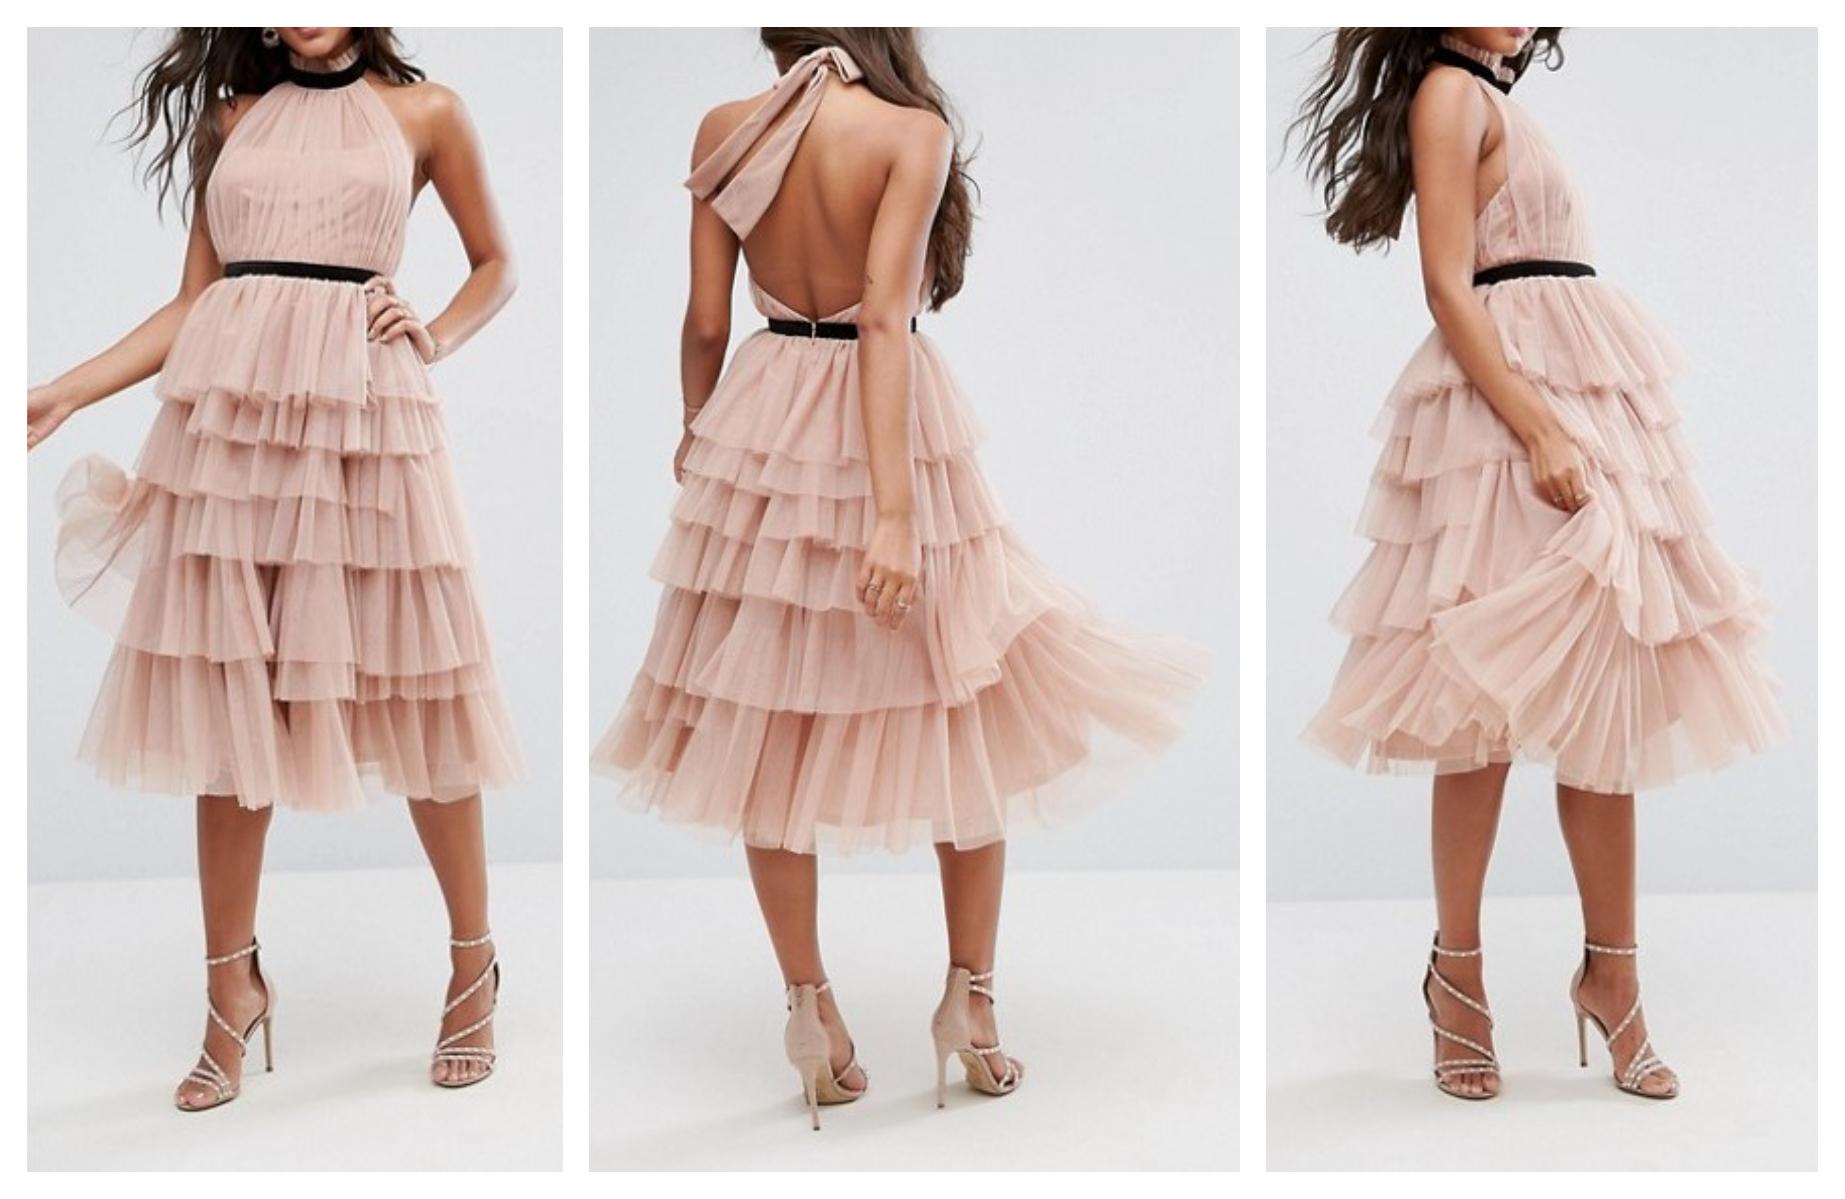 d0c201c690cdbf ex29 sukienka tiulowa falbany wesele XS/S 34/36 - 7310963898 ...